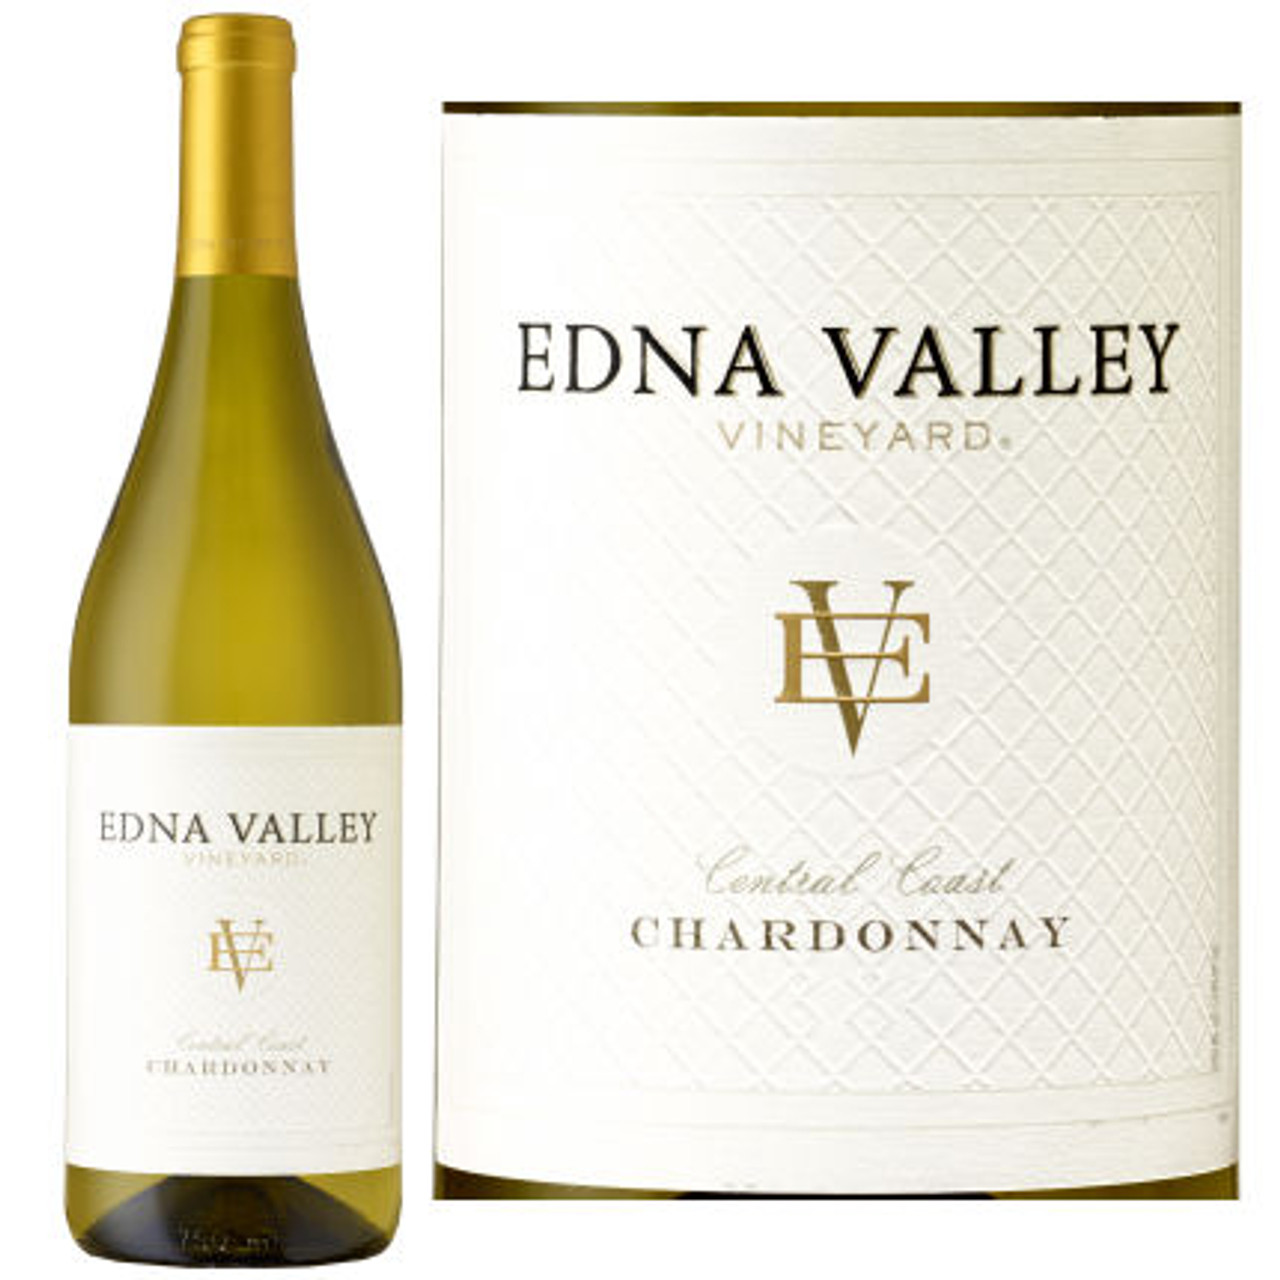 Edna Valley Vineyard Central Coast Chardonnay